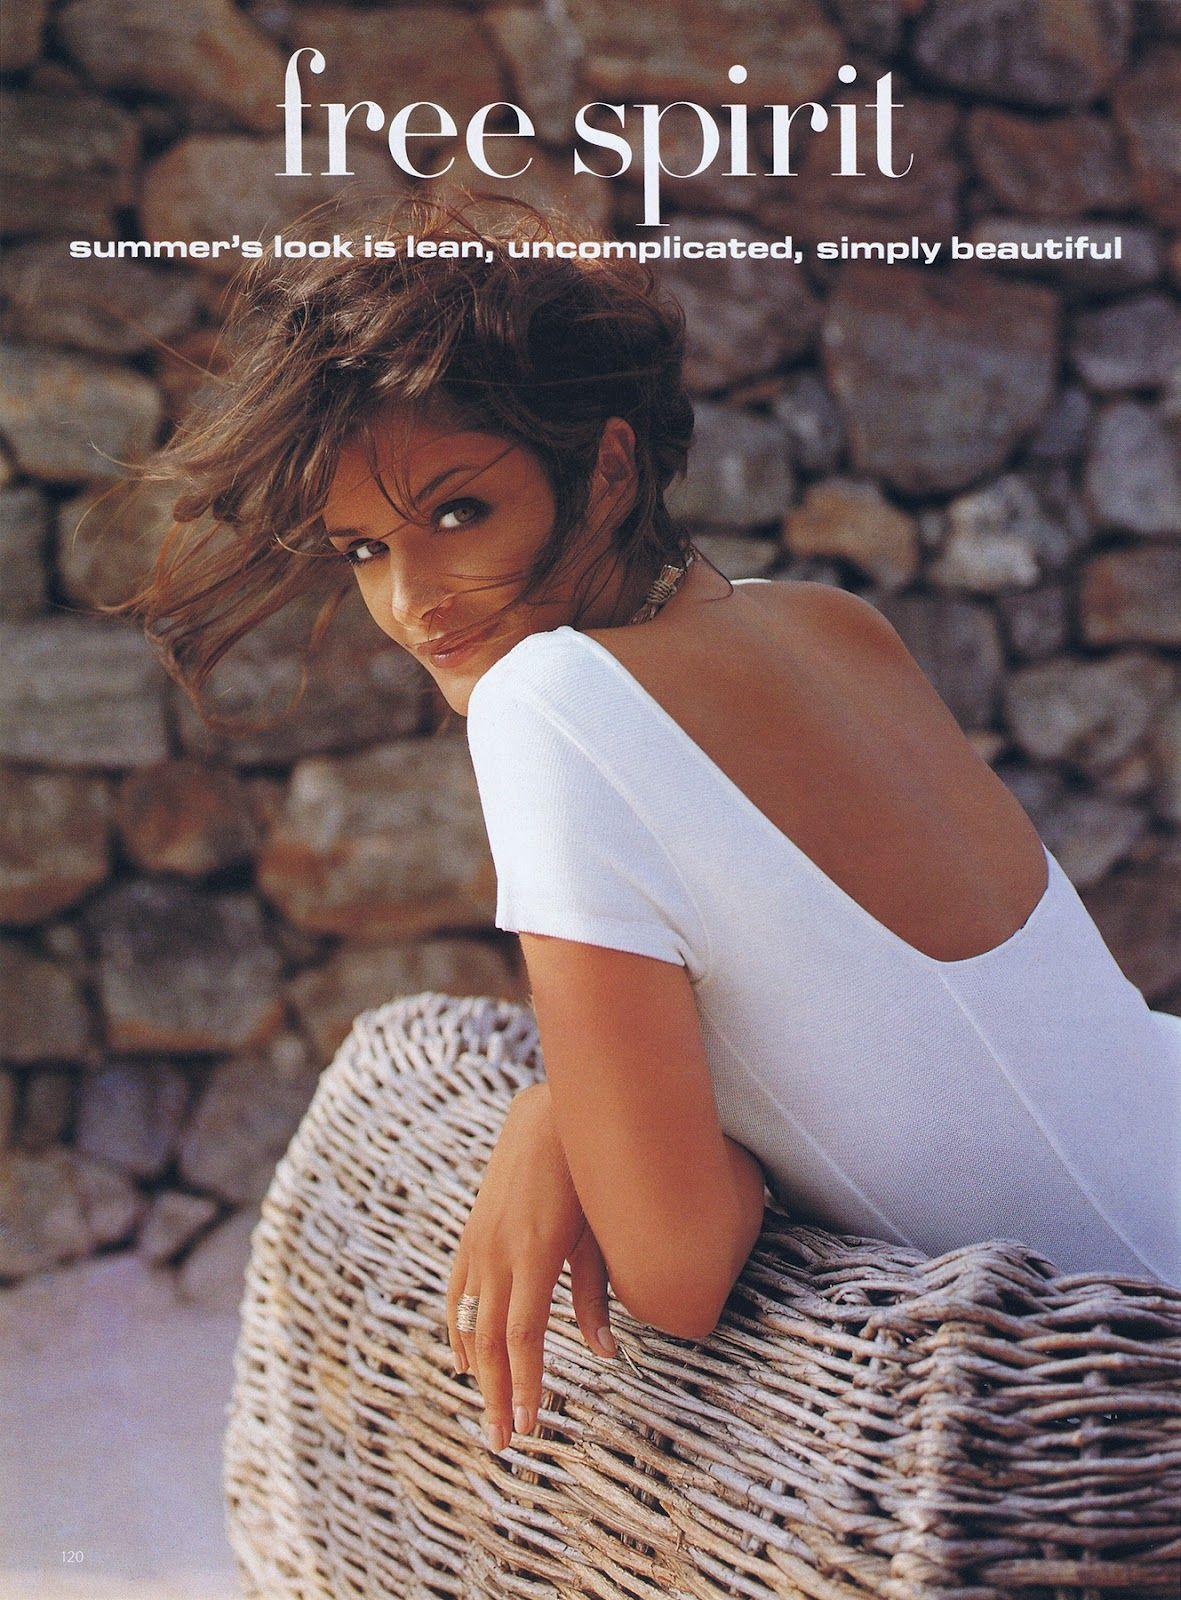 Helena Christensen by Fabrizio Ferri UK Vogue Aug. 1992